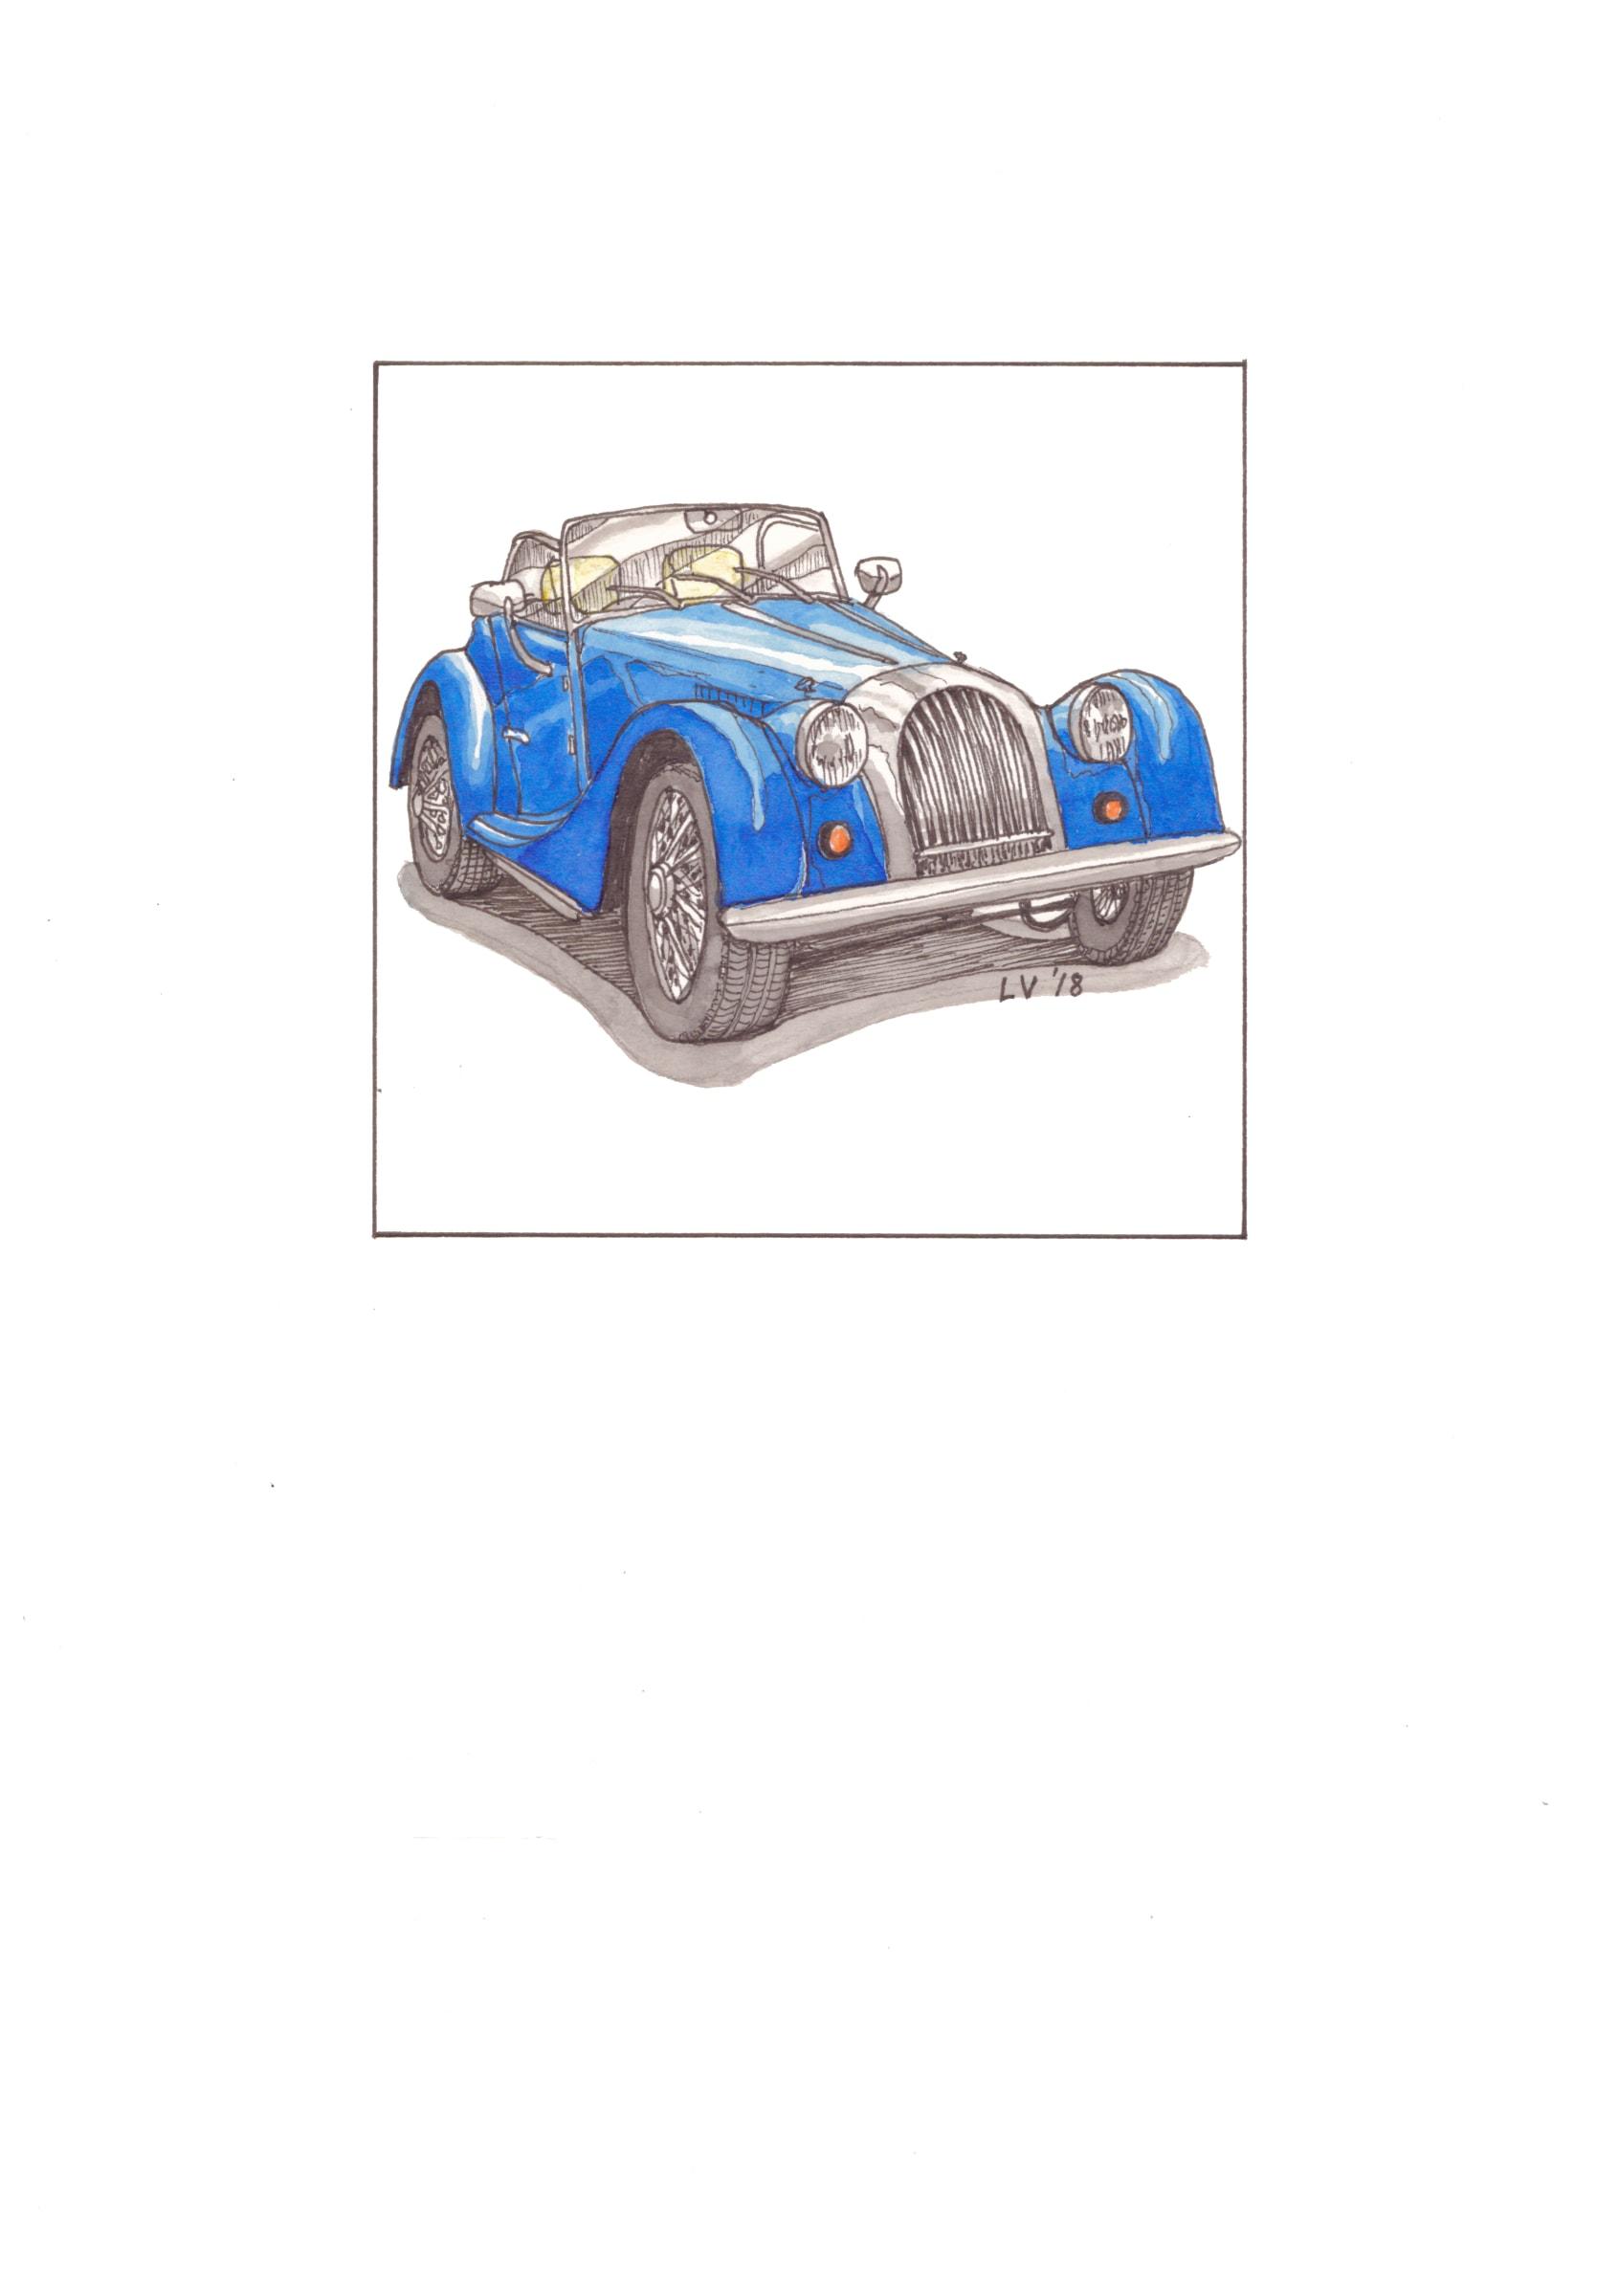 <span class=&#34;link fancybox-details-link&#34;><a href=&#34;/artworks/2252-leonora-venter-1963-morgan-plus4-2018/&#34;>View Detail Page</a></span><div class=&#34;artist&#34;><strong>Leonora Venter</strong></div> <div class=&#34;title&#34;><em>1963 Morgan Plus4</em>, 2018</div> <div class=&#34;medium&#34;>Coloured Ink On Paper</div> <div class=&#34;dimensions&#34;>14.5cm x 10.5cm</div><div class=&#34;price&#34;>R600.00</div>